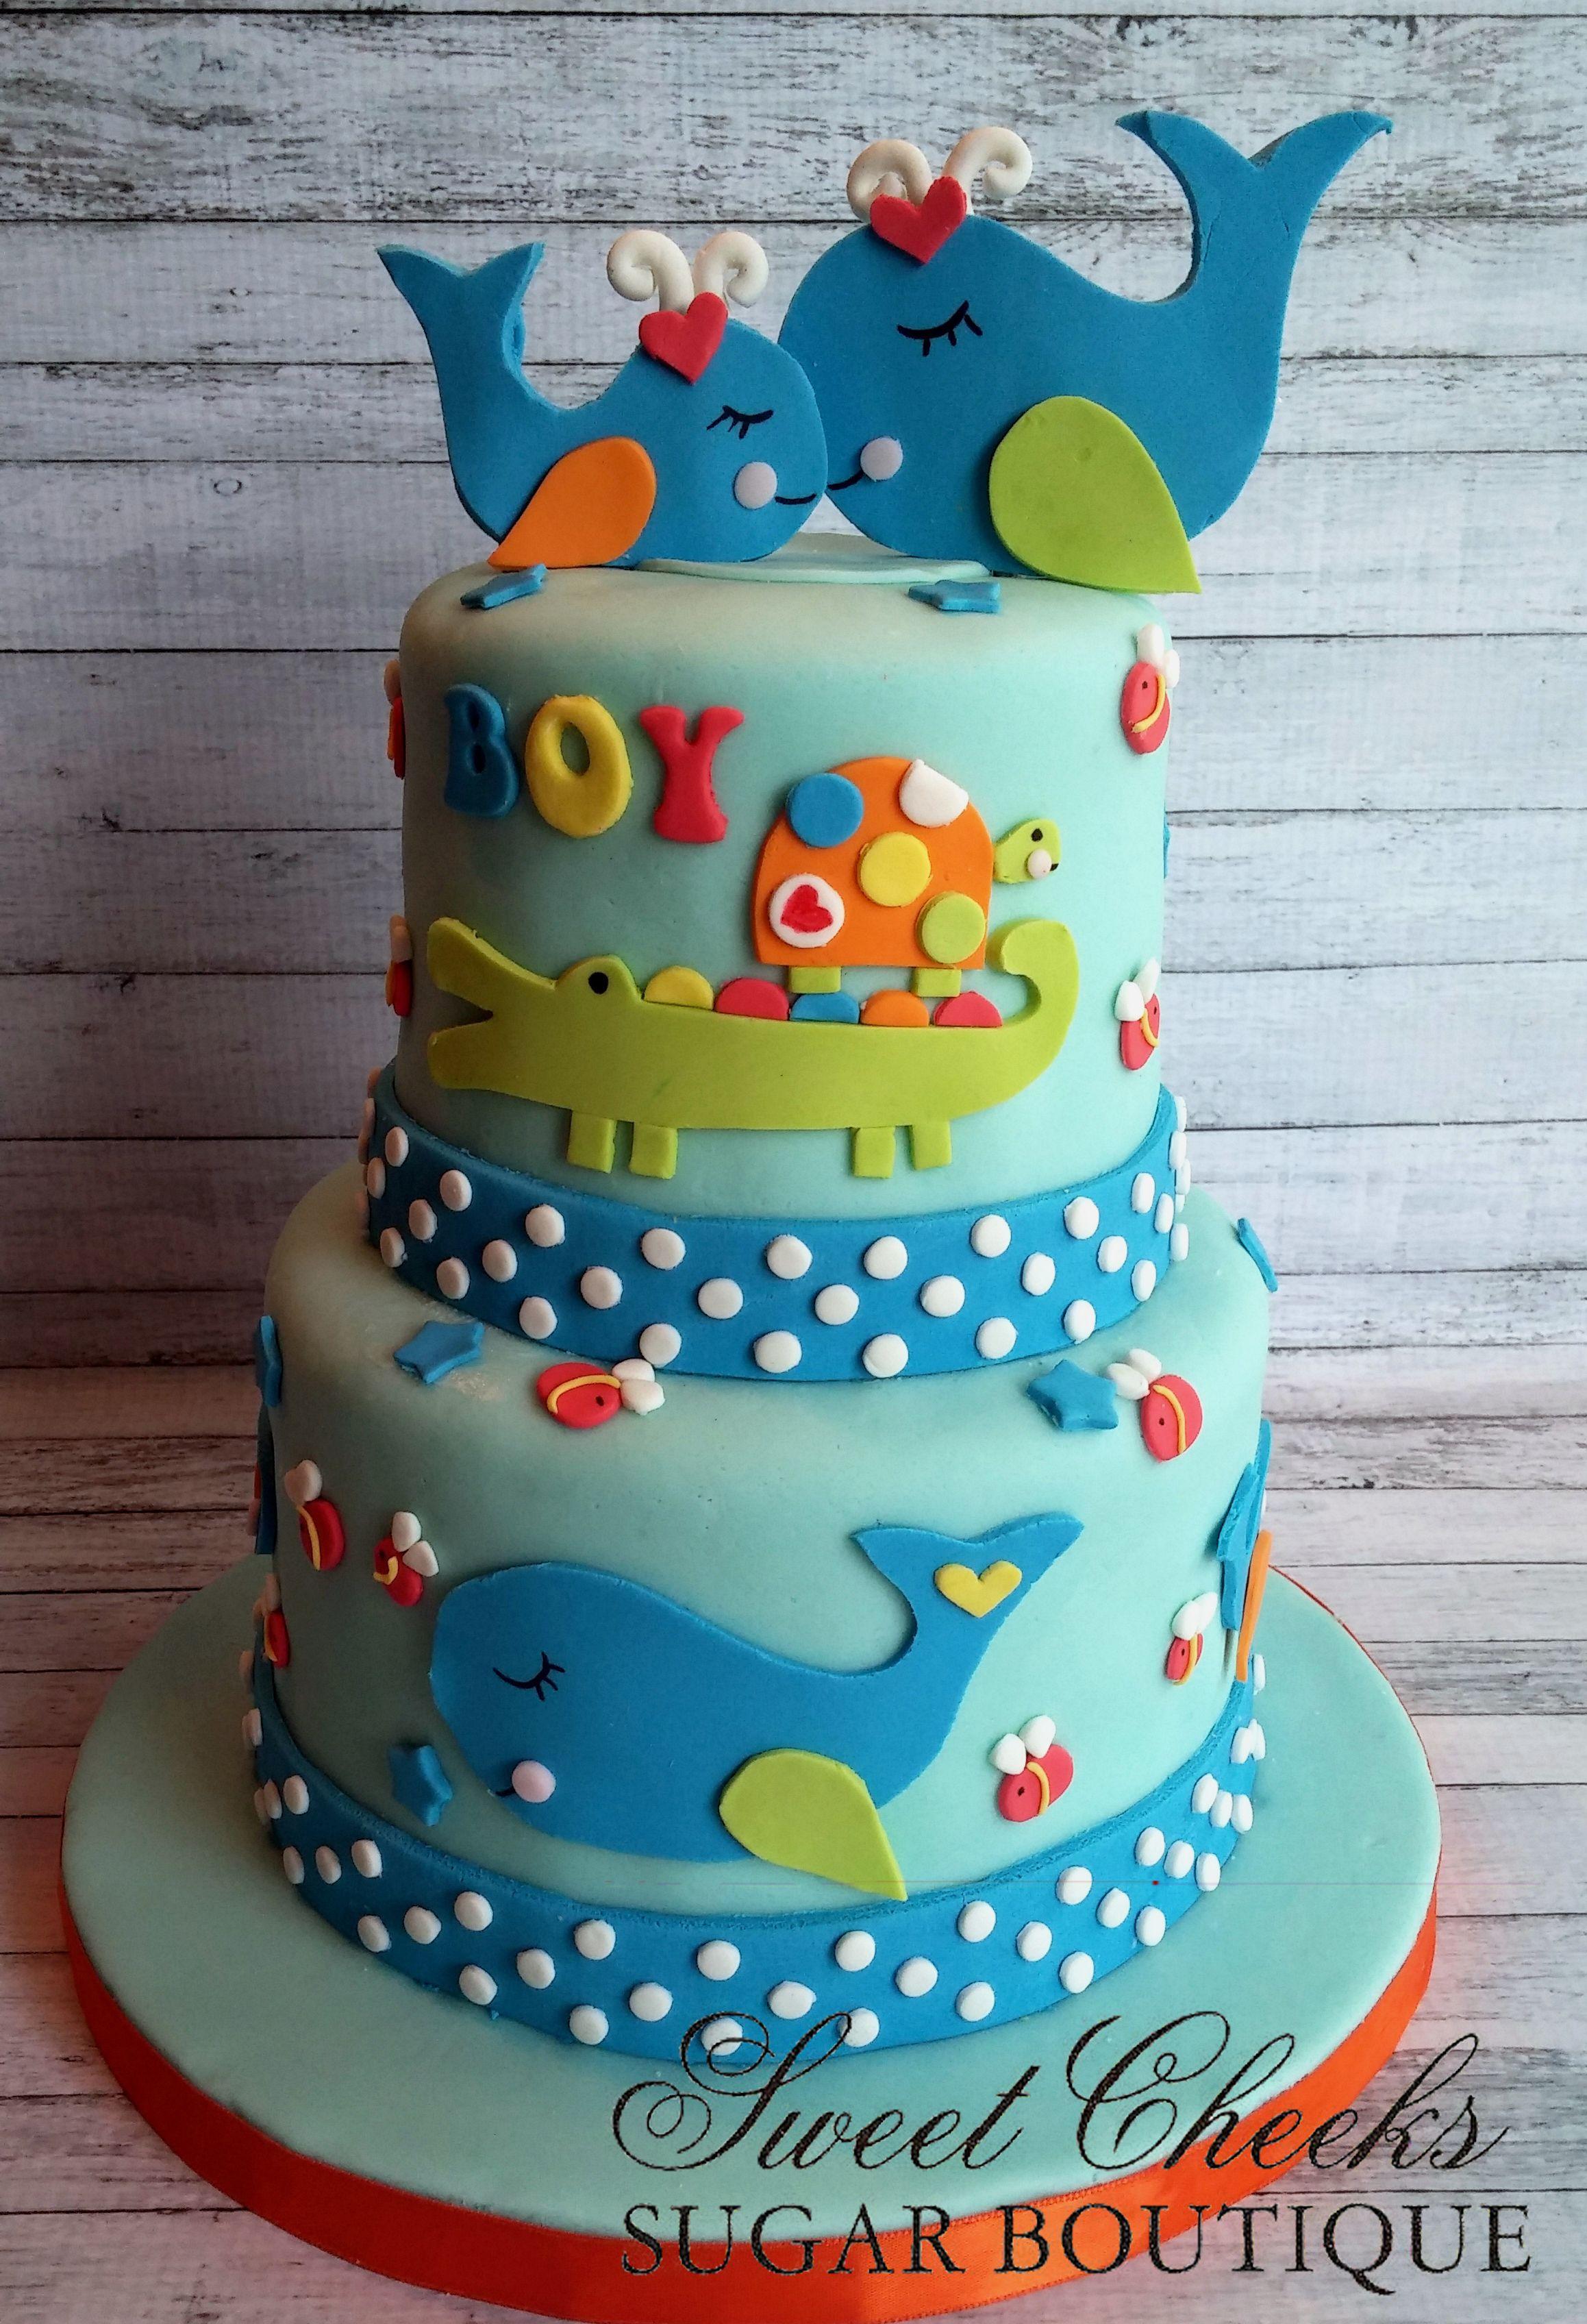 A Texans themed birthday cake for Ramon Happy Birthday